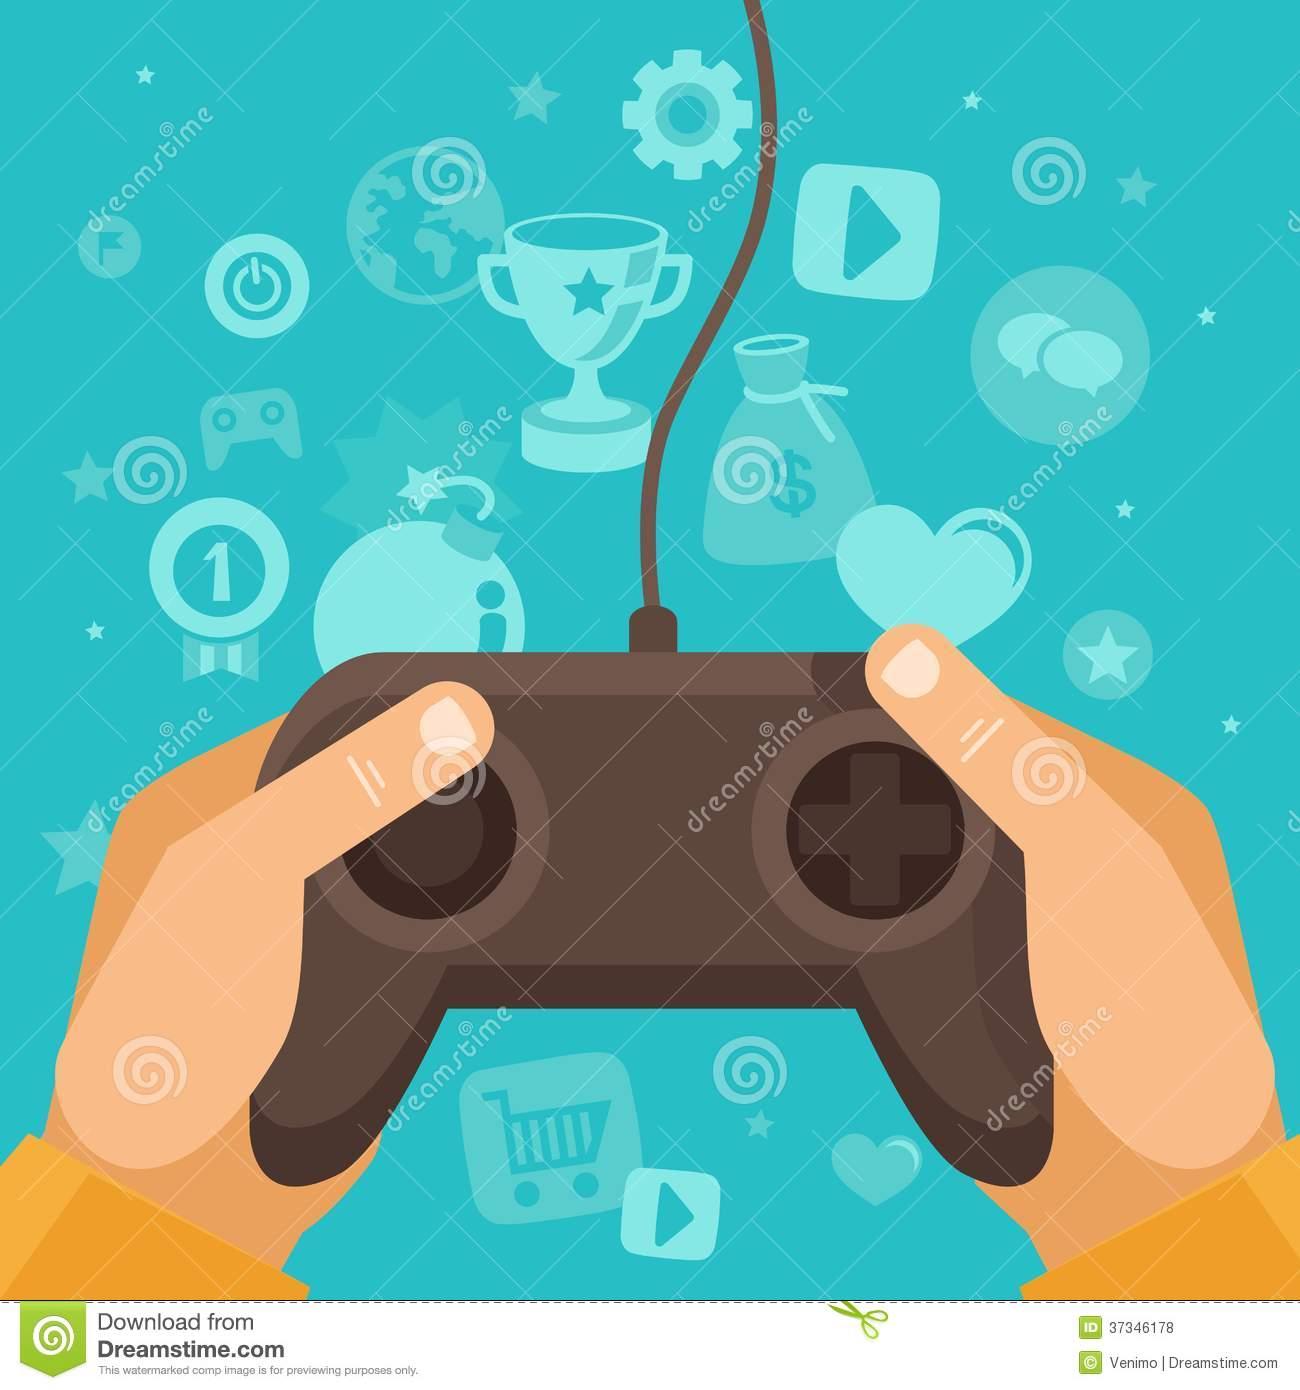 Vector Online Game Concept Royalty Free Stock Photos.